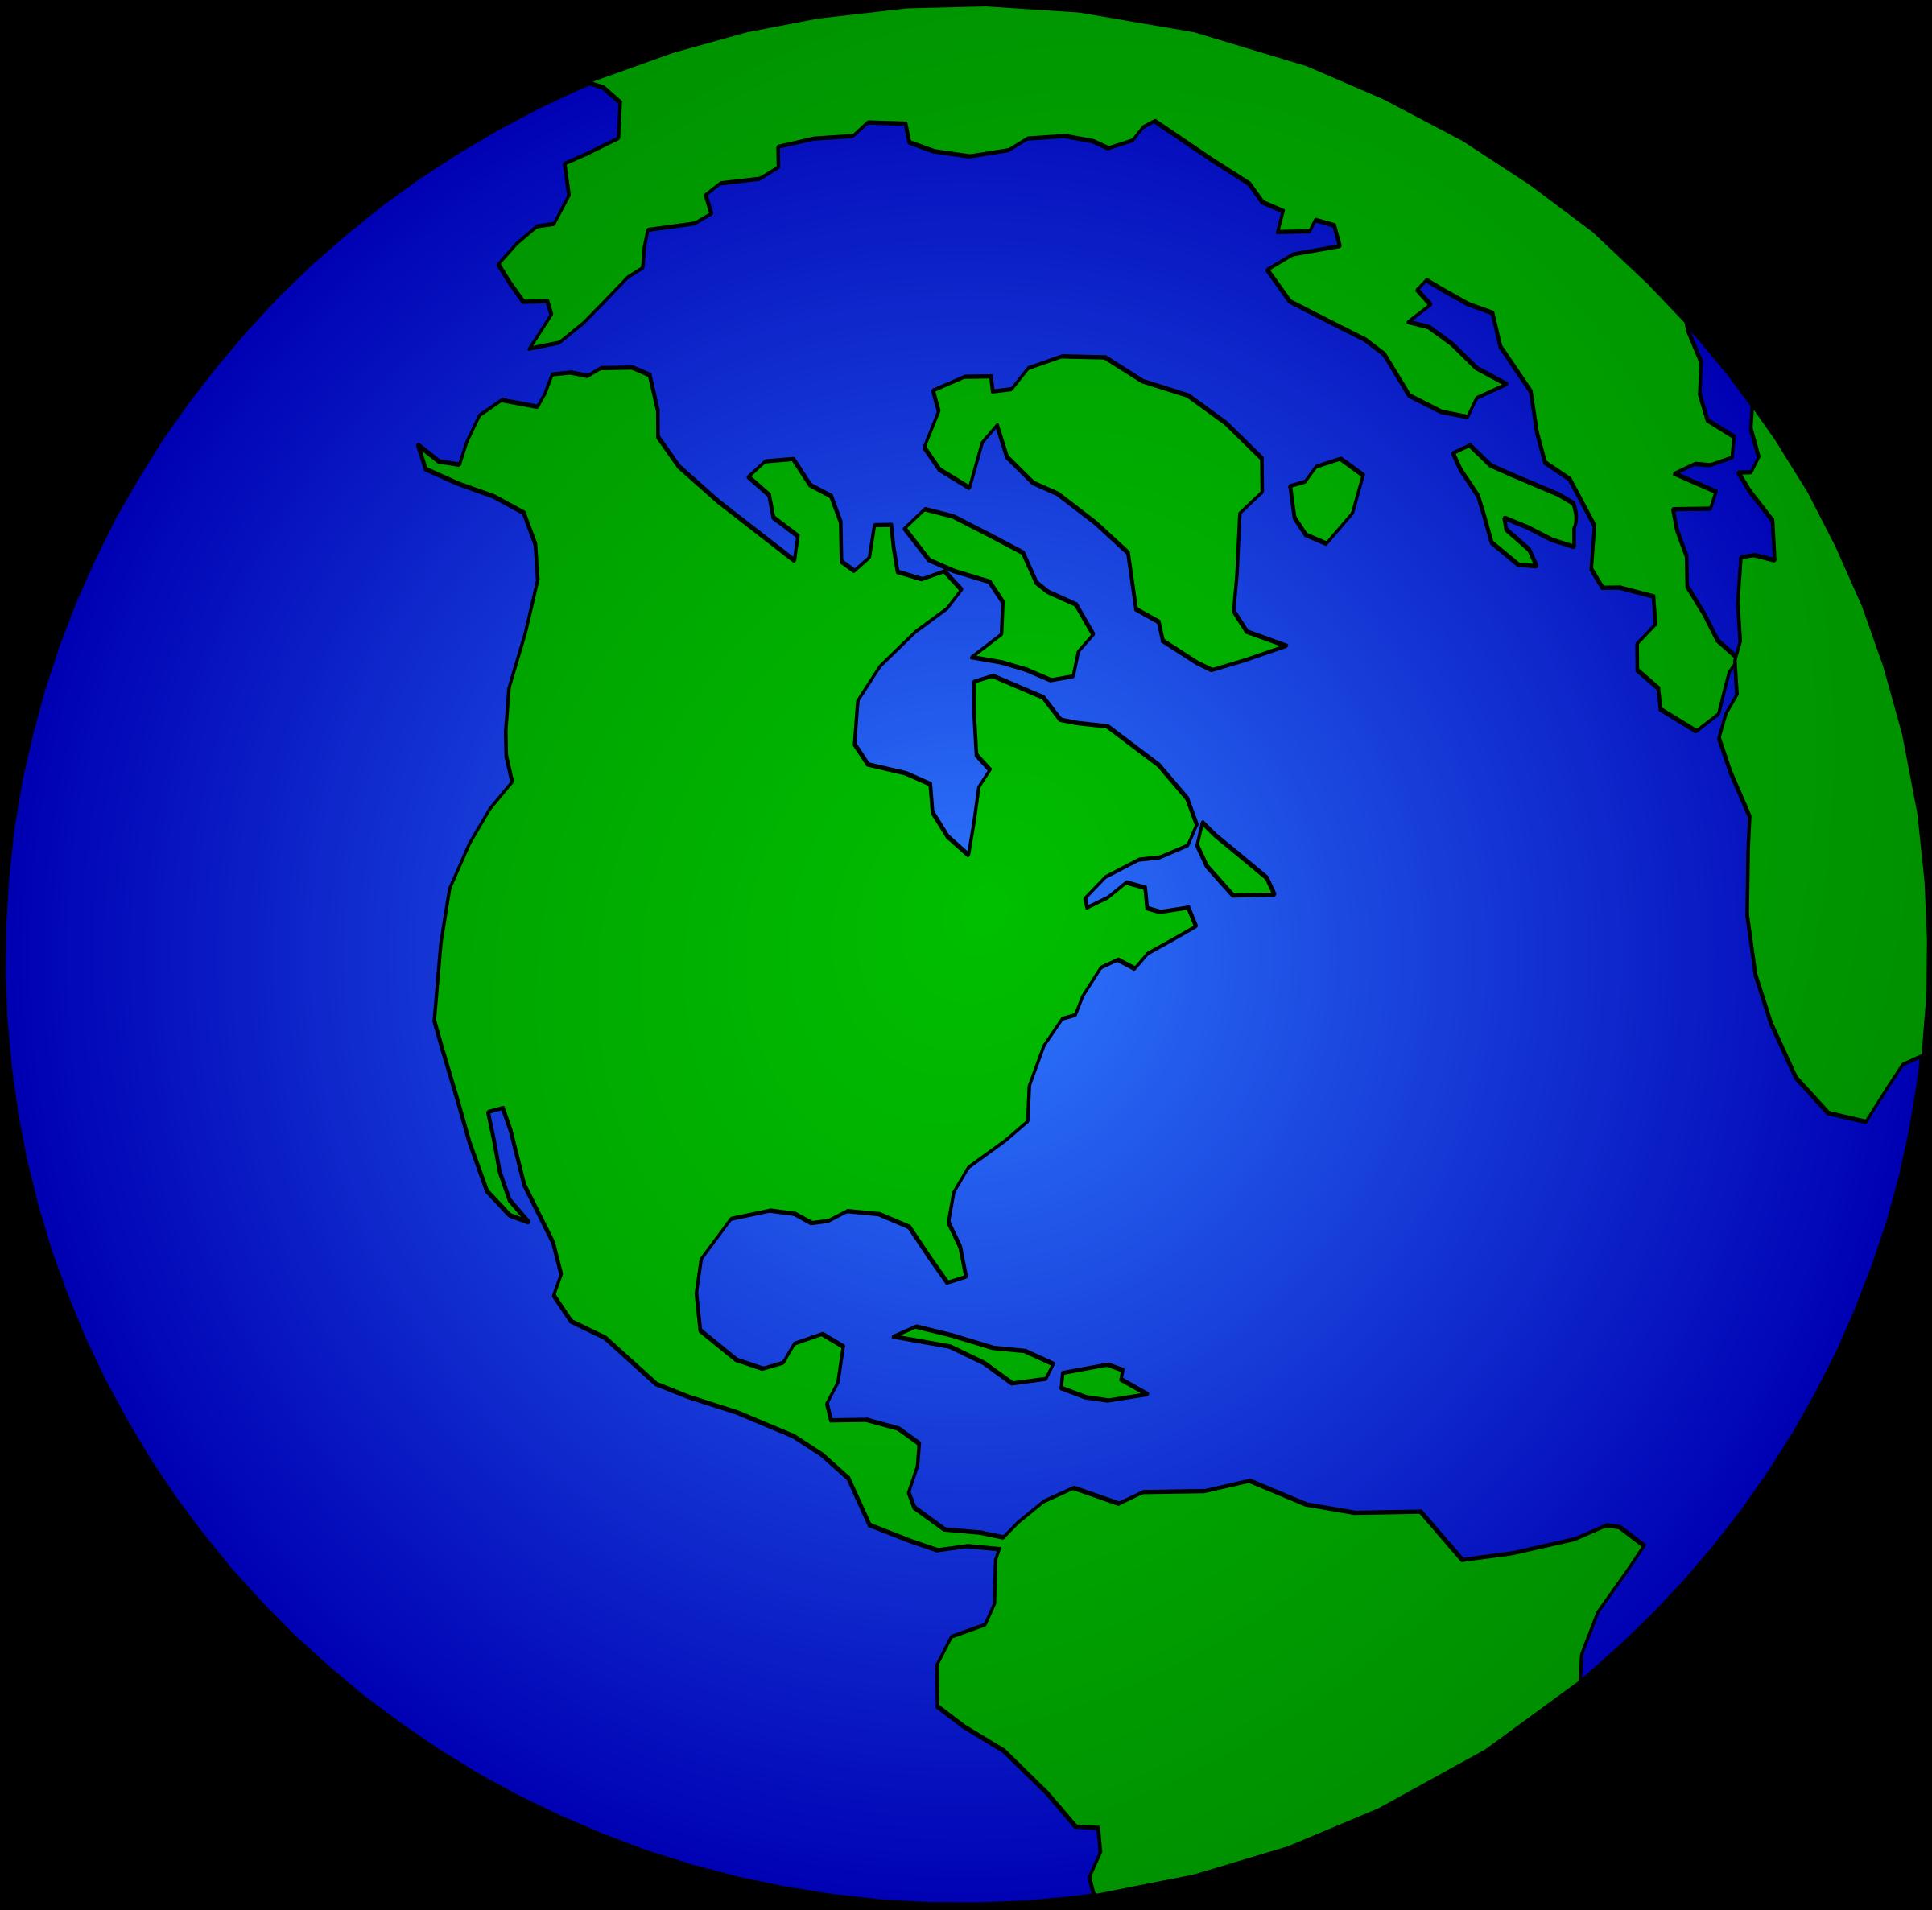 World Image Clip Art - The World Clipart